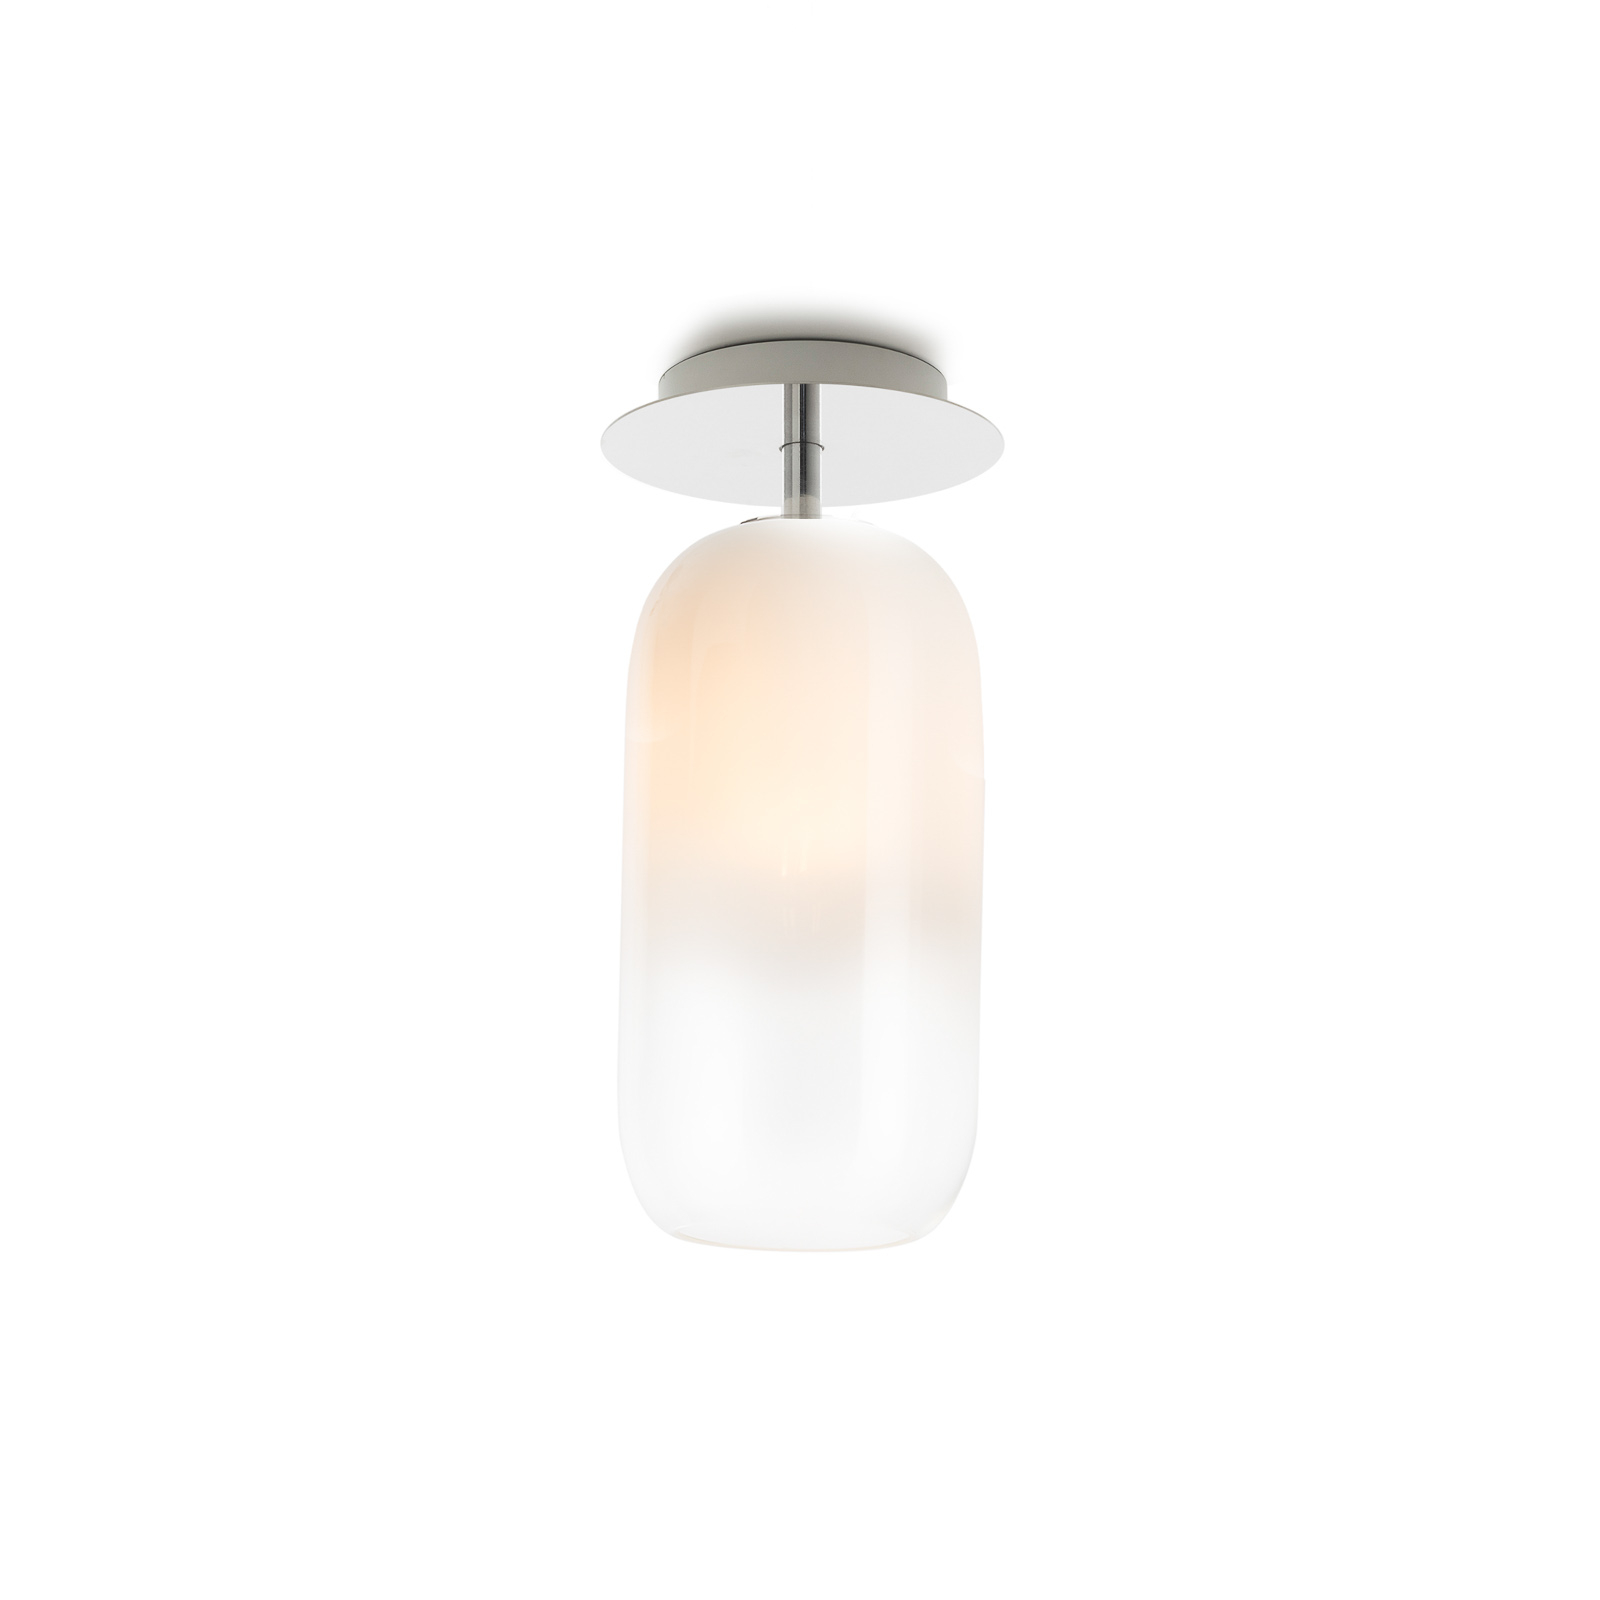 Artemide Gople Mini taklampe hvit